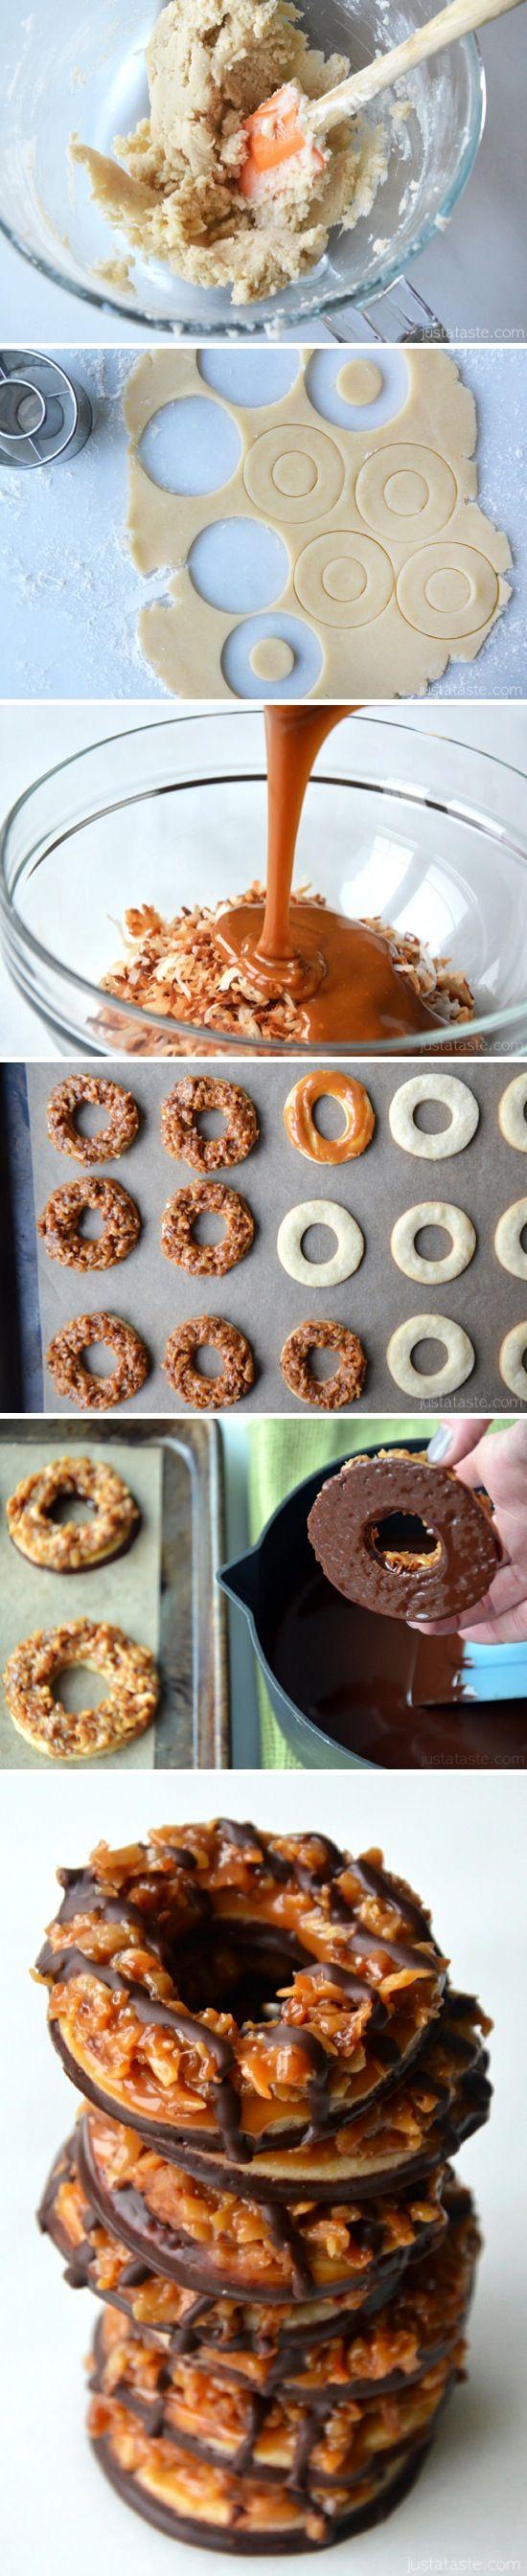 Homemade Samoa Girl Scout Cookies